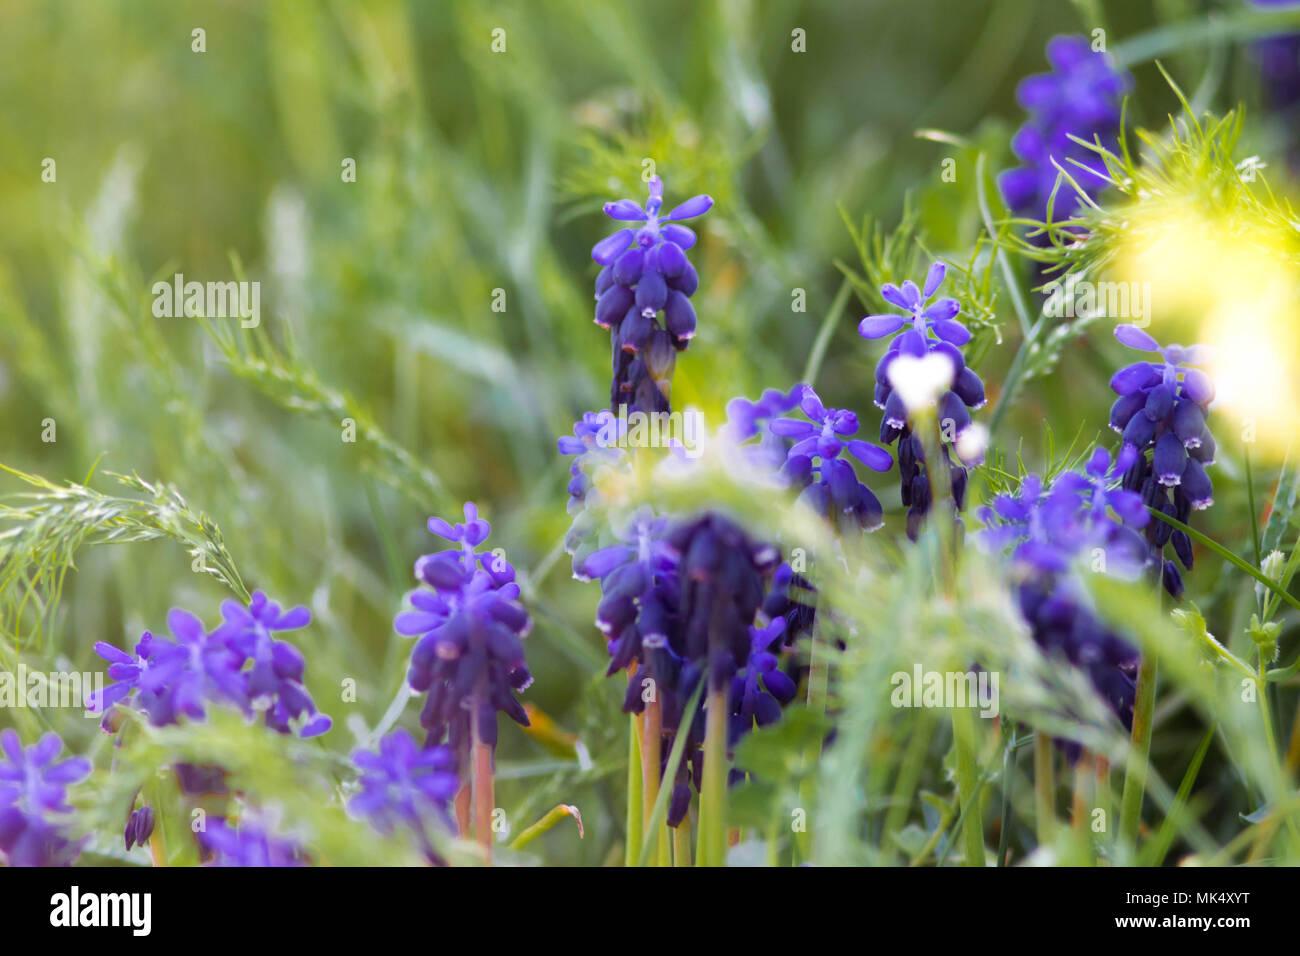 Blühende Pflanze Lavendel Hohes Gras Stockfoto Bild 183891116 Alamy